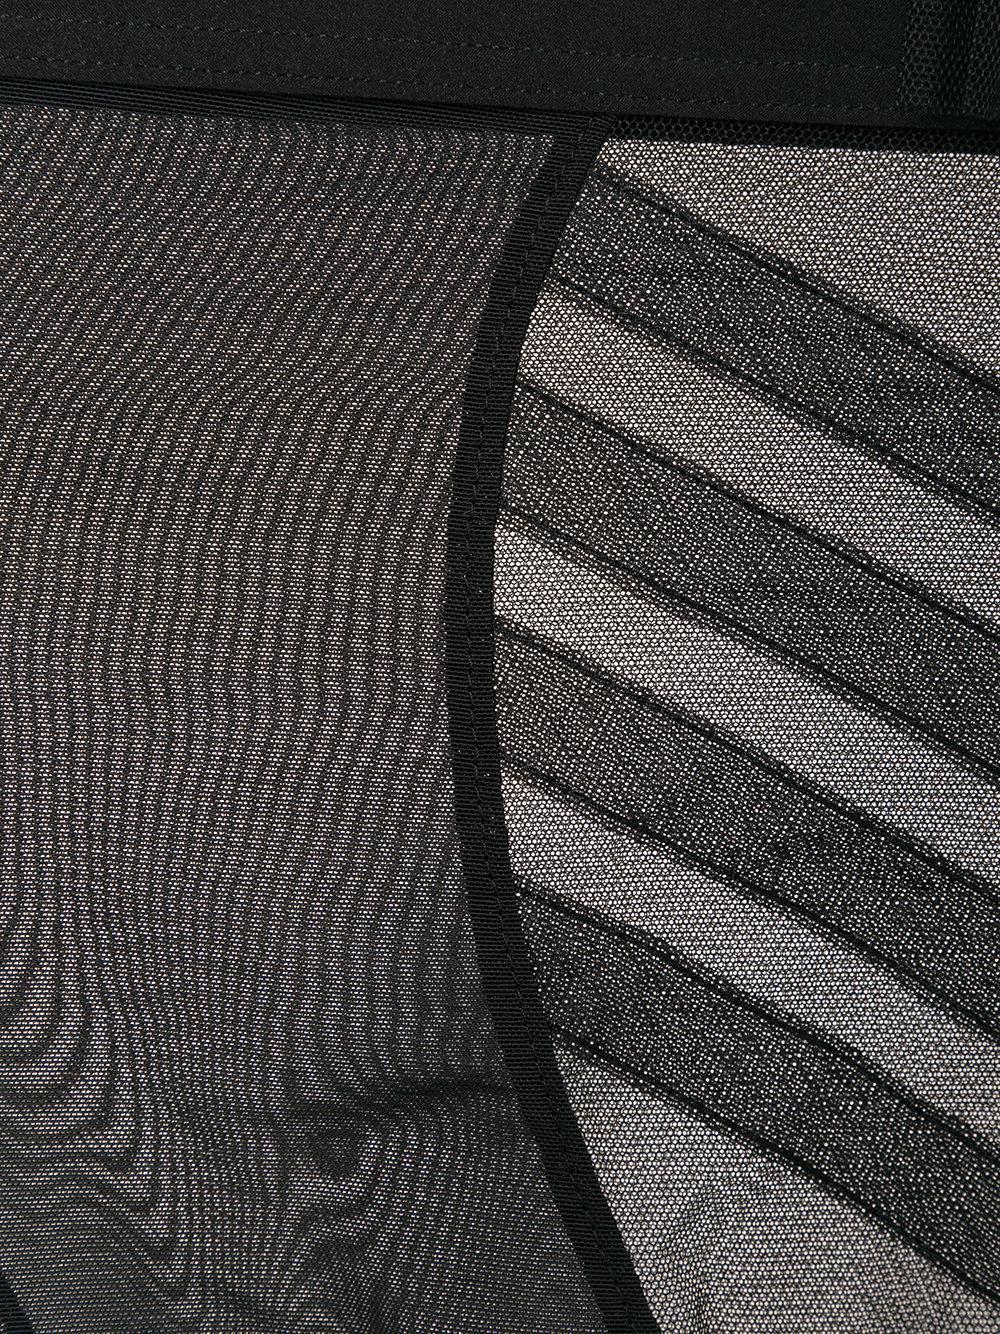 baf0c1d7e6c Chantal Thomass - Black Sheer Embroidered Briefs - Lyst. View fullscreen